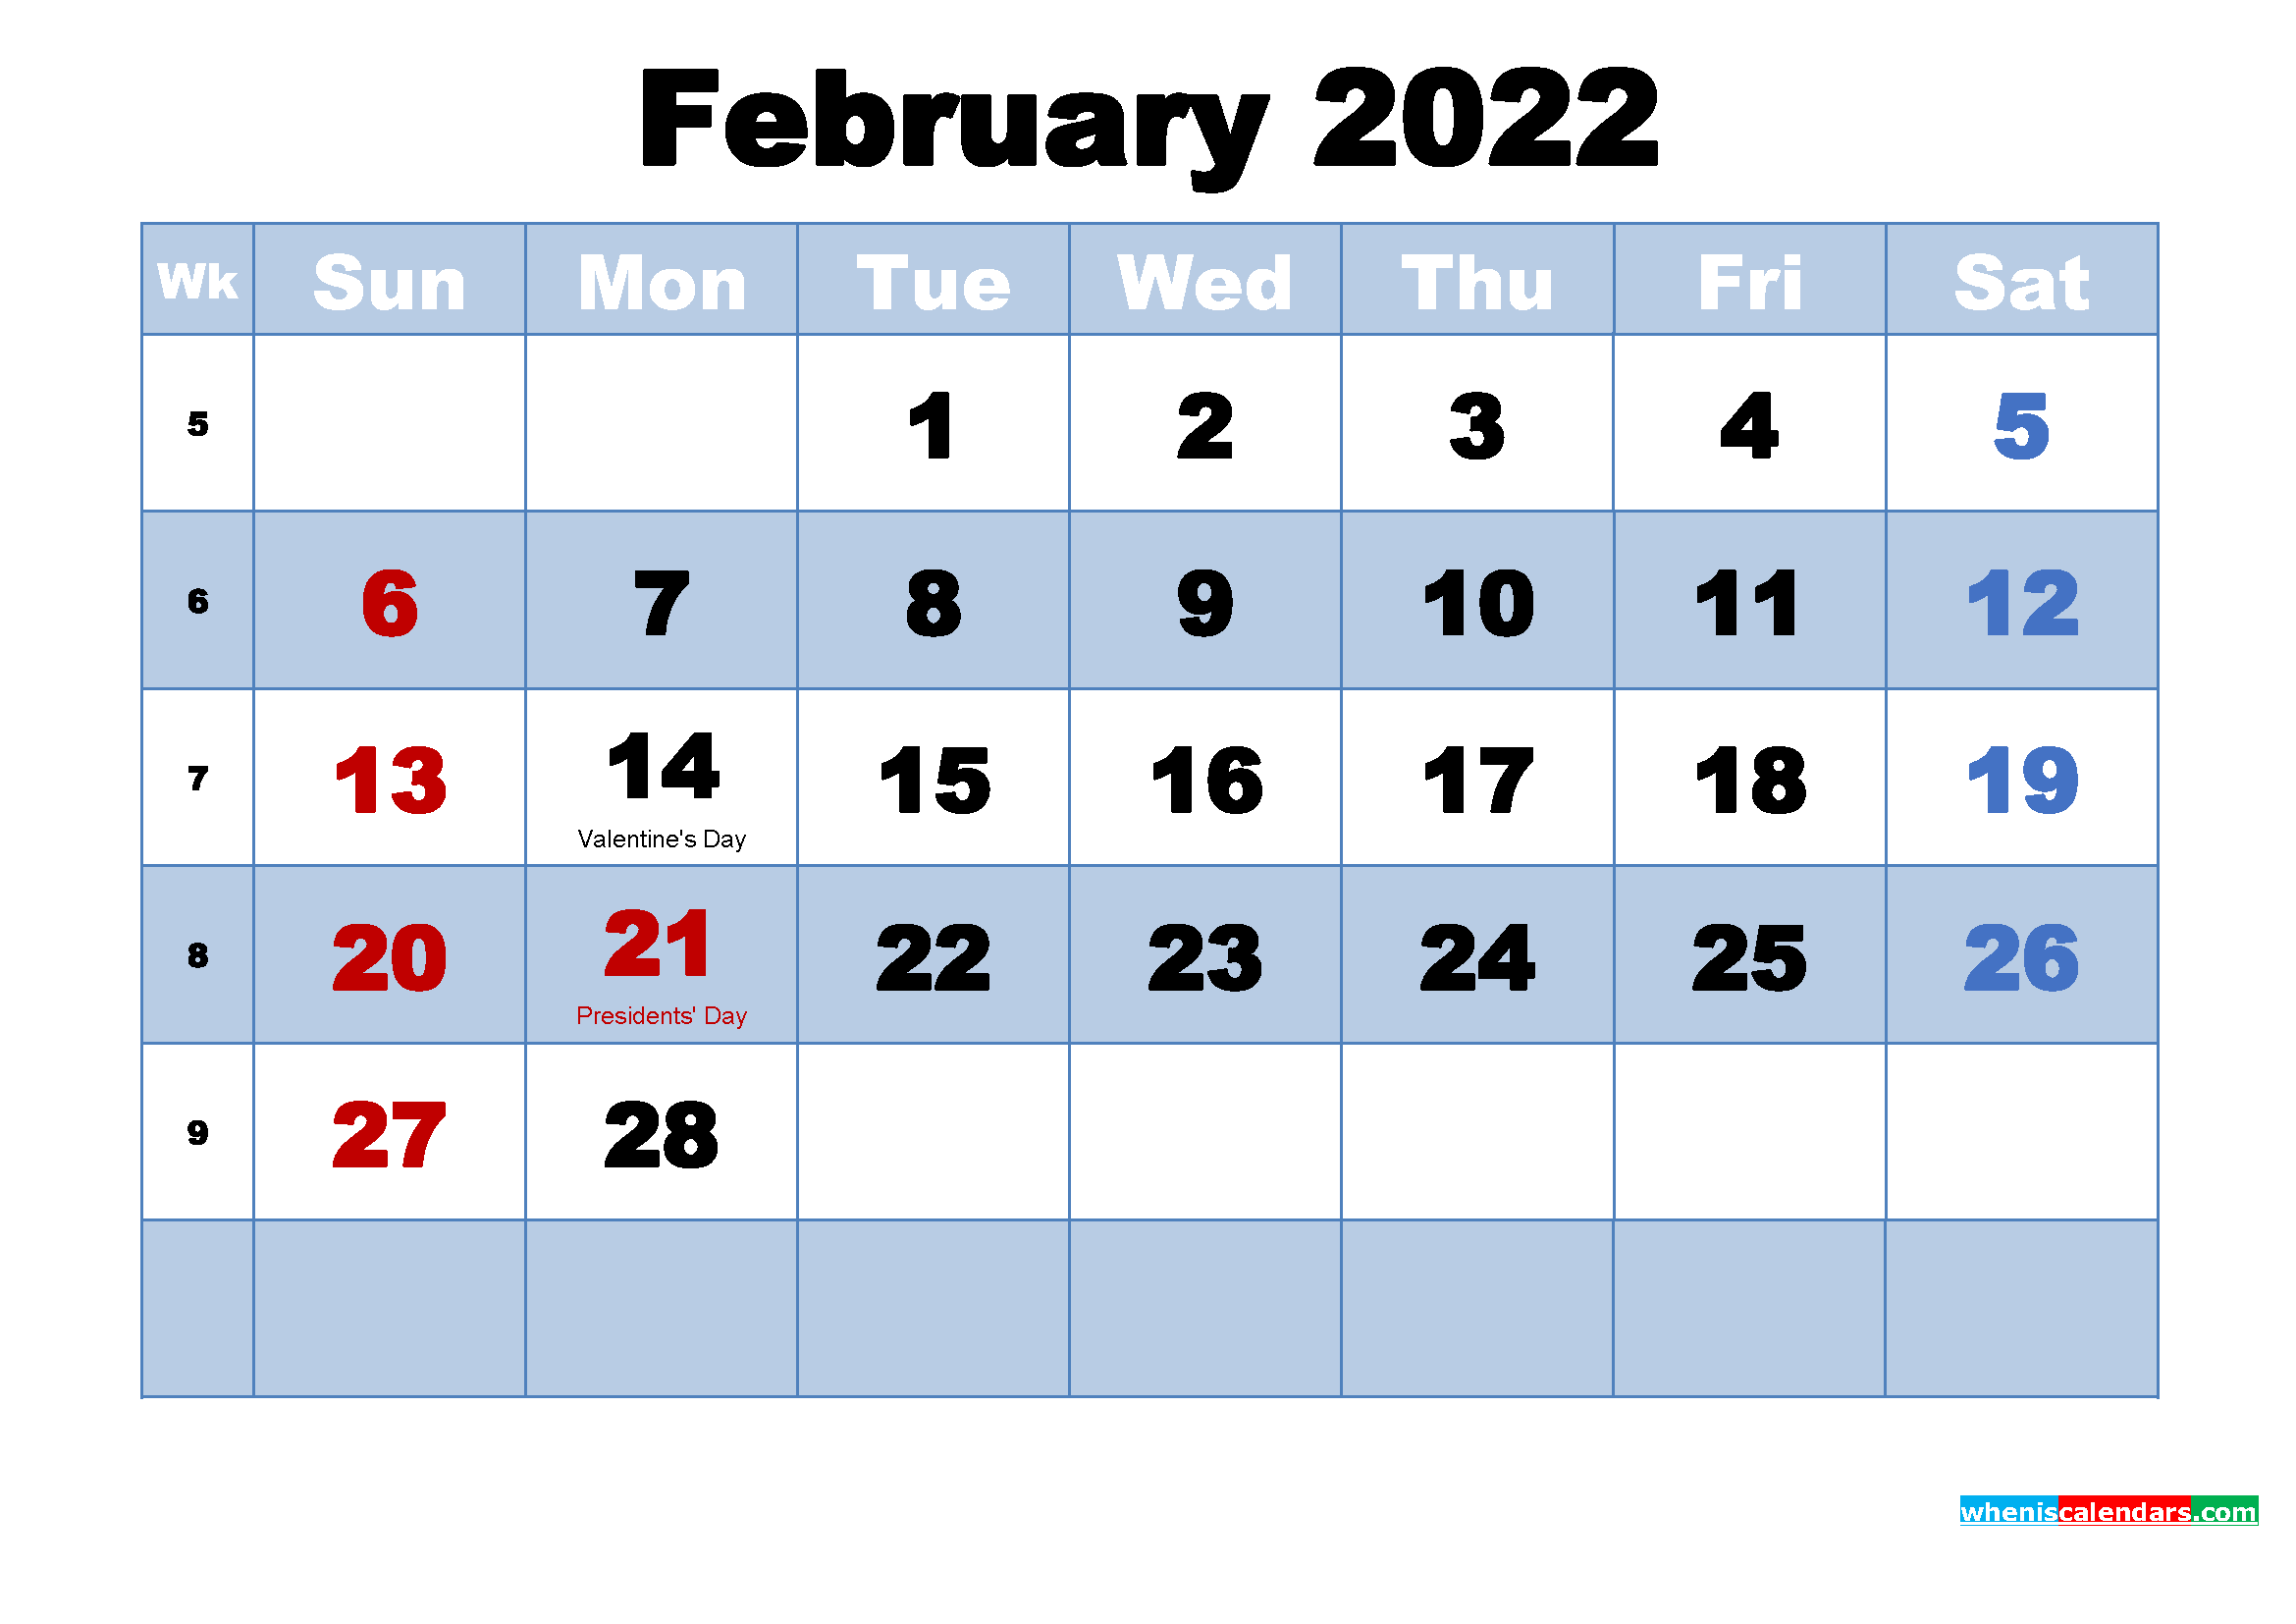 Free Printable 2022 Calendar February as Word, PDF